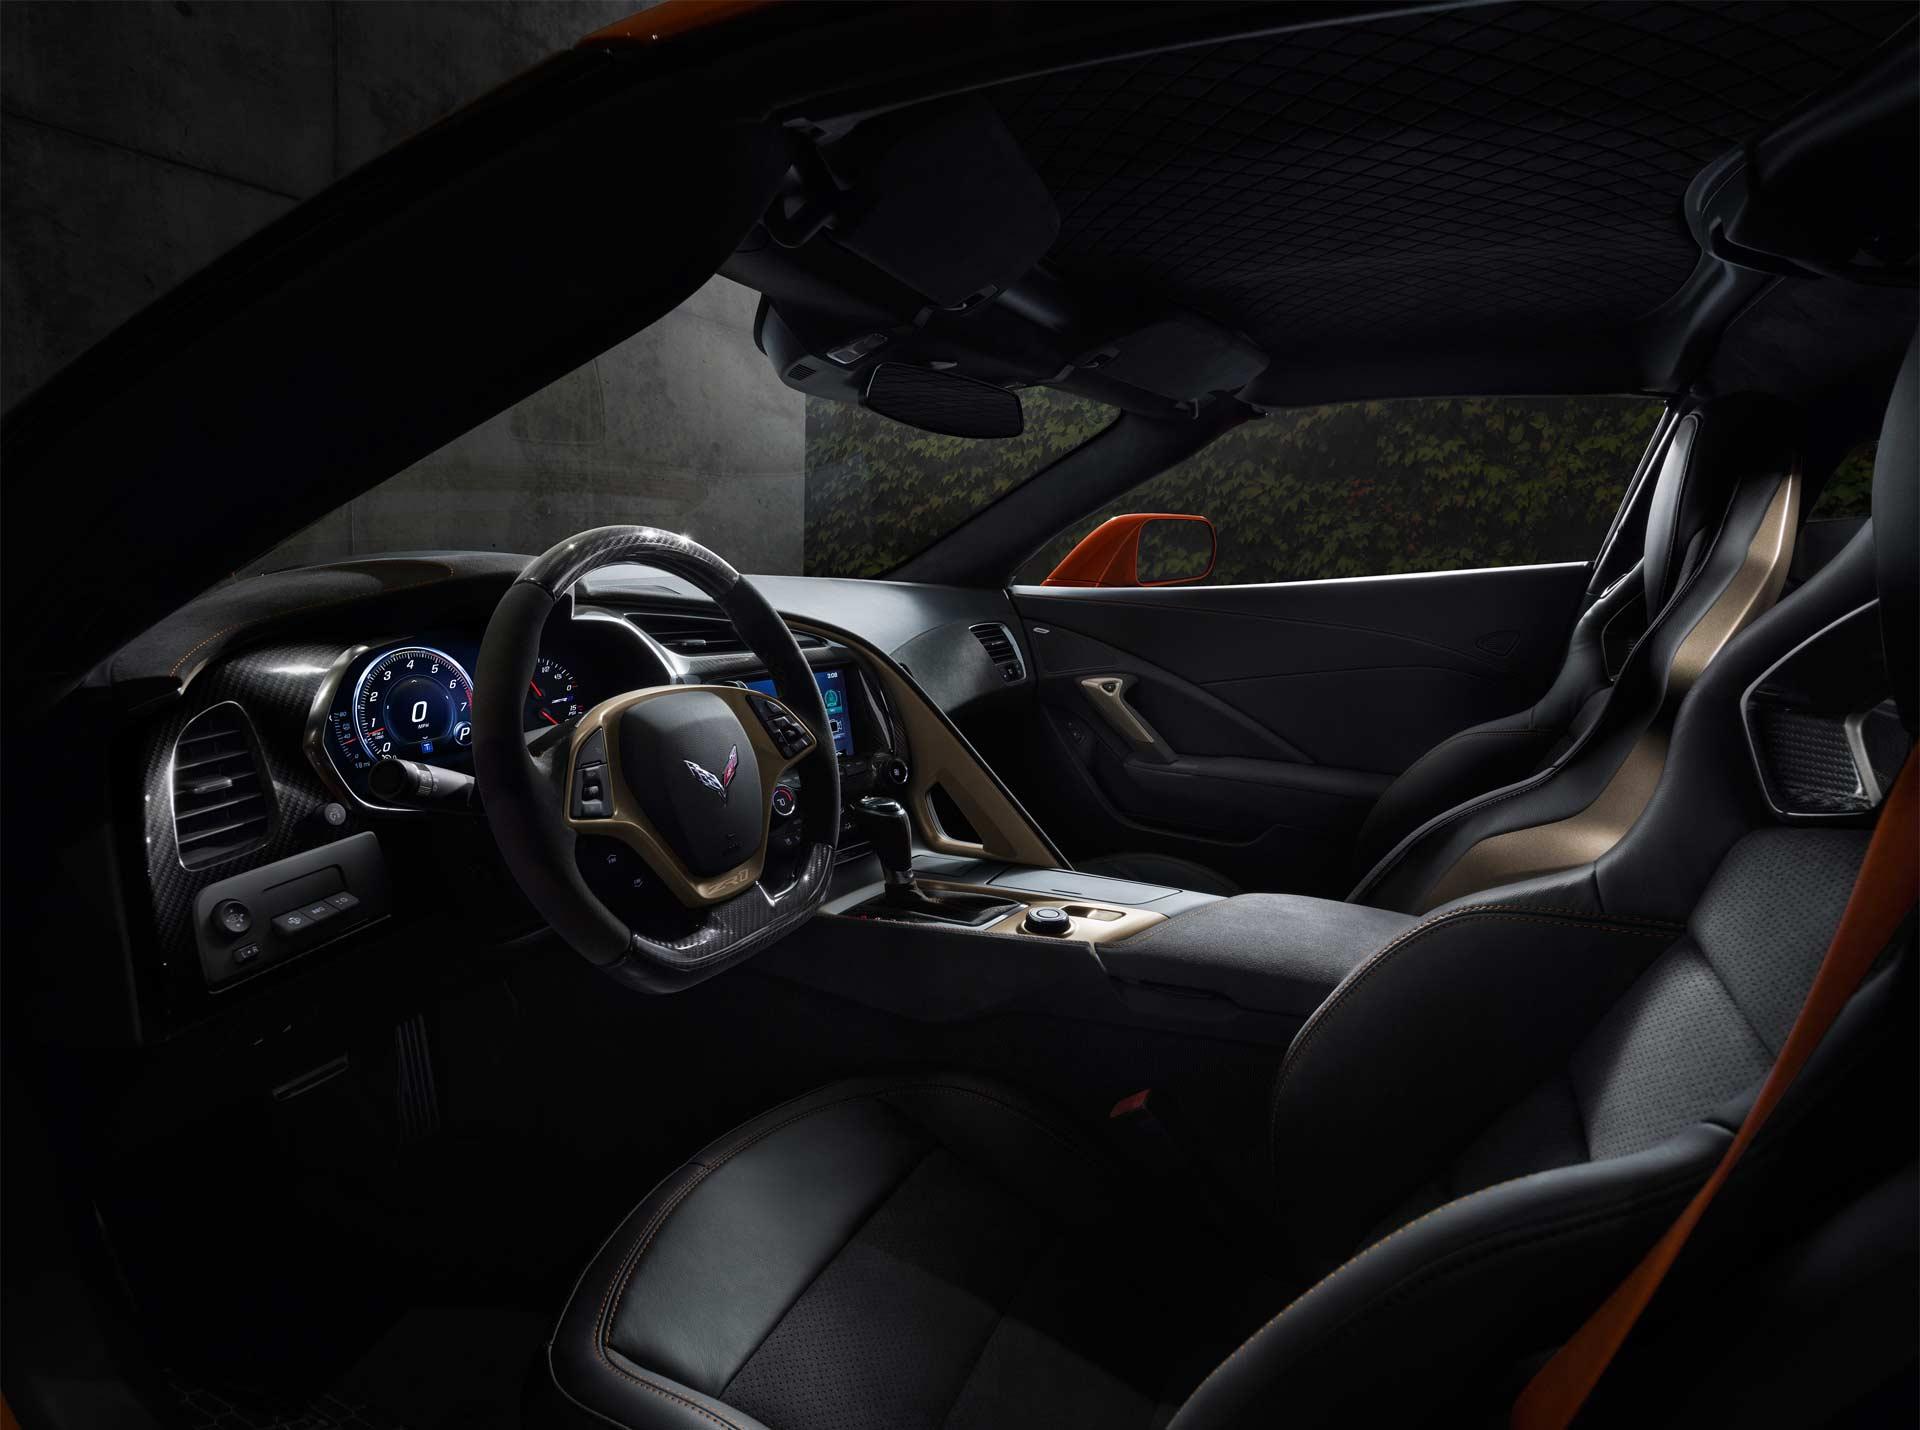 2019-Chevrolet-Corvette-ZR1-interior